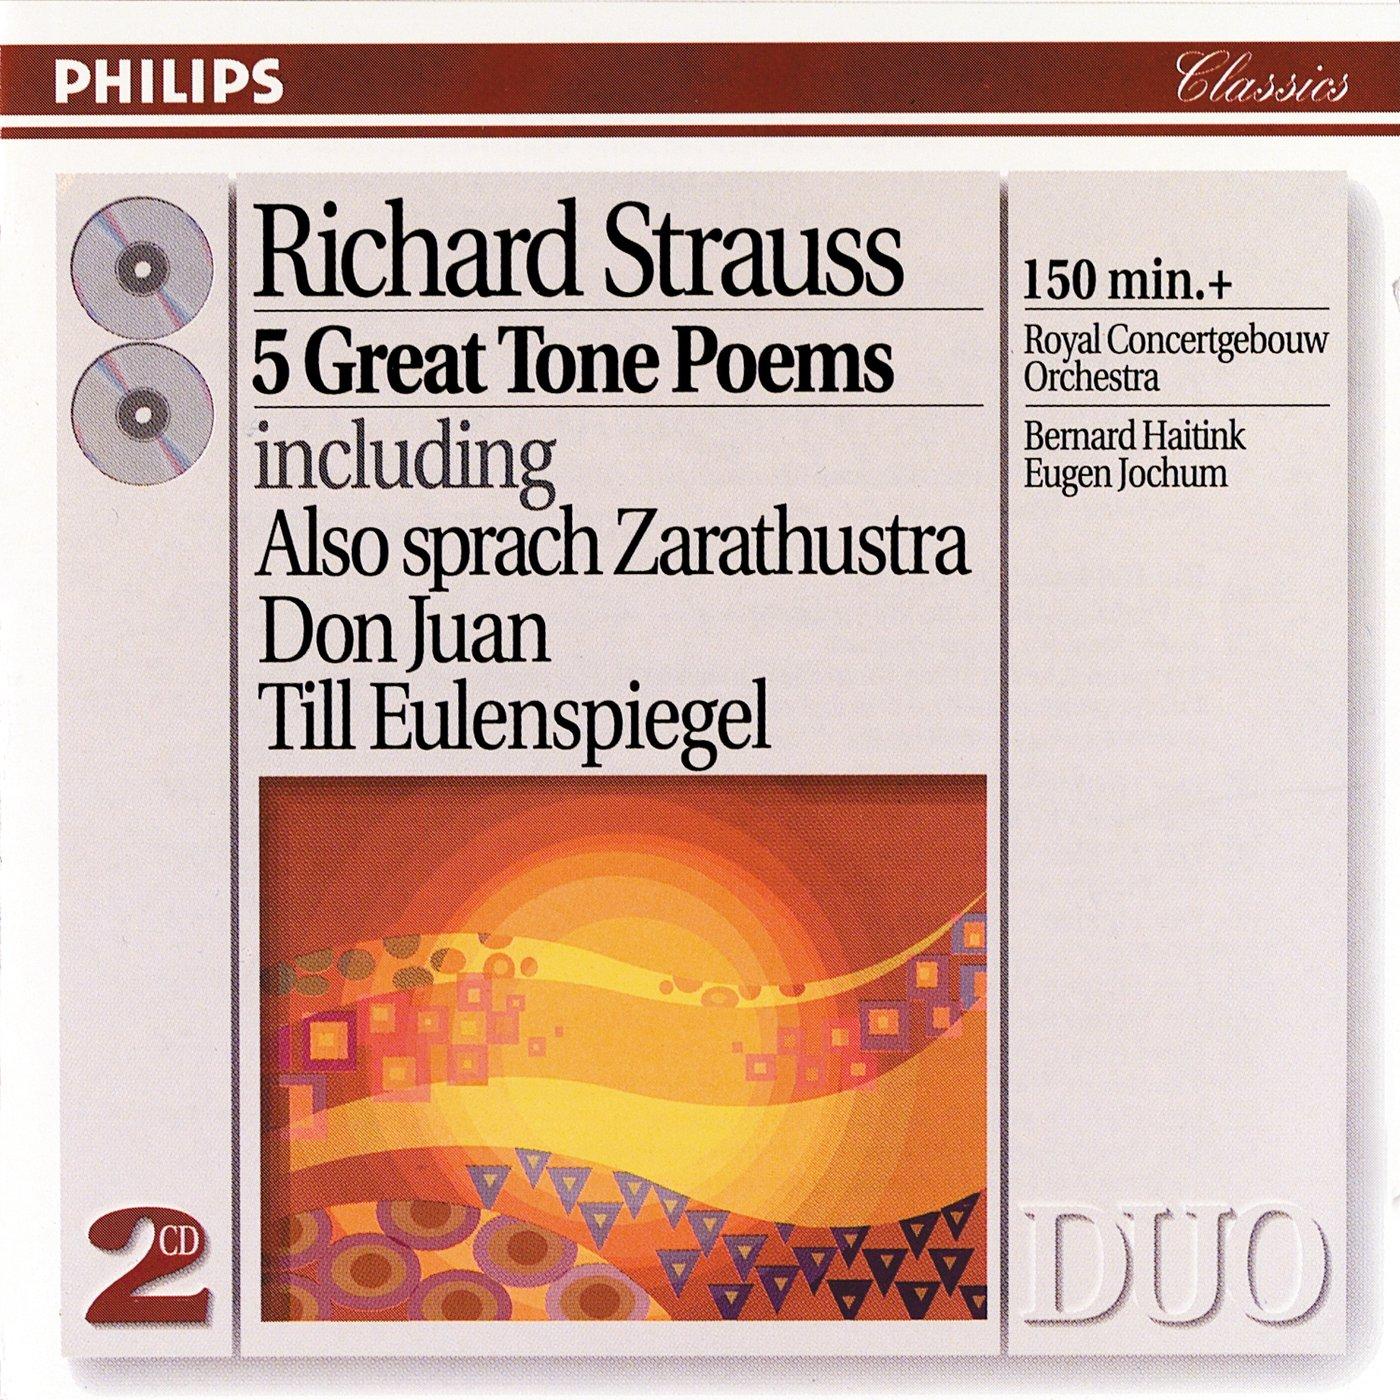 Richard Strauss, Haitink, Jochum, Royal Concertgebouw Orch. - Strauss: 5  Great Tone Poems - Amazon.com Music